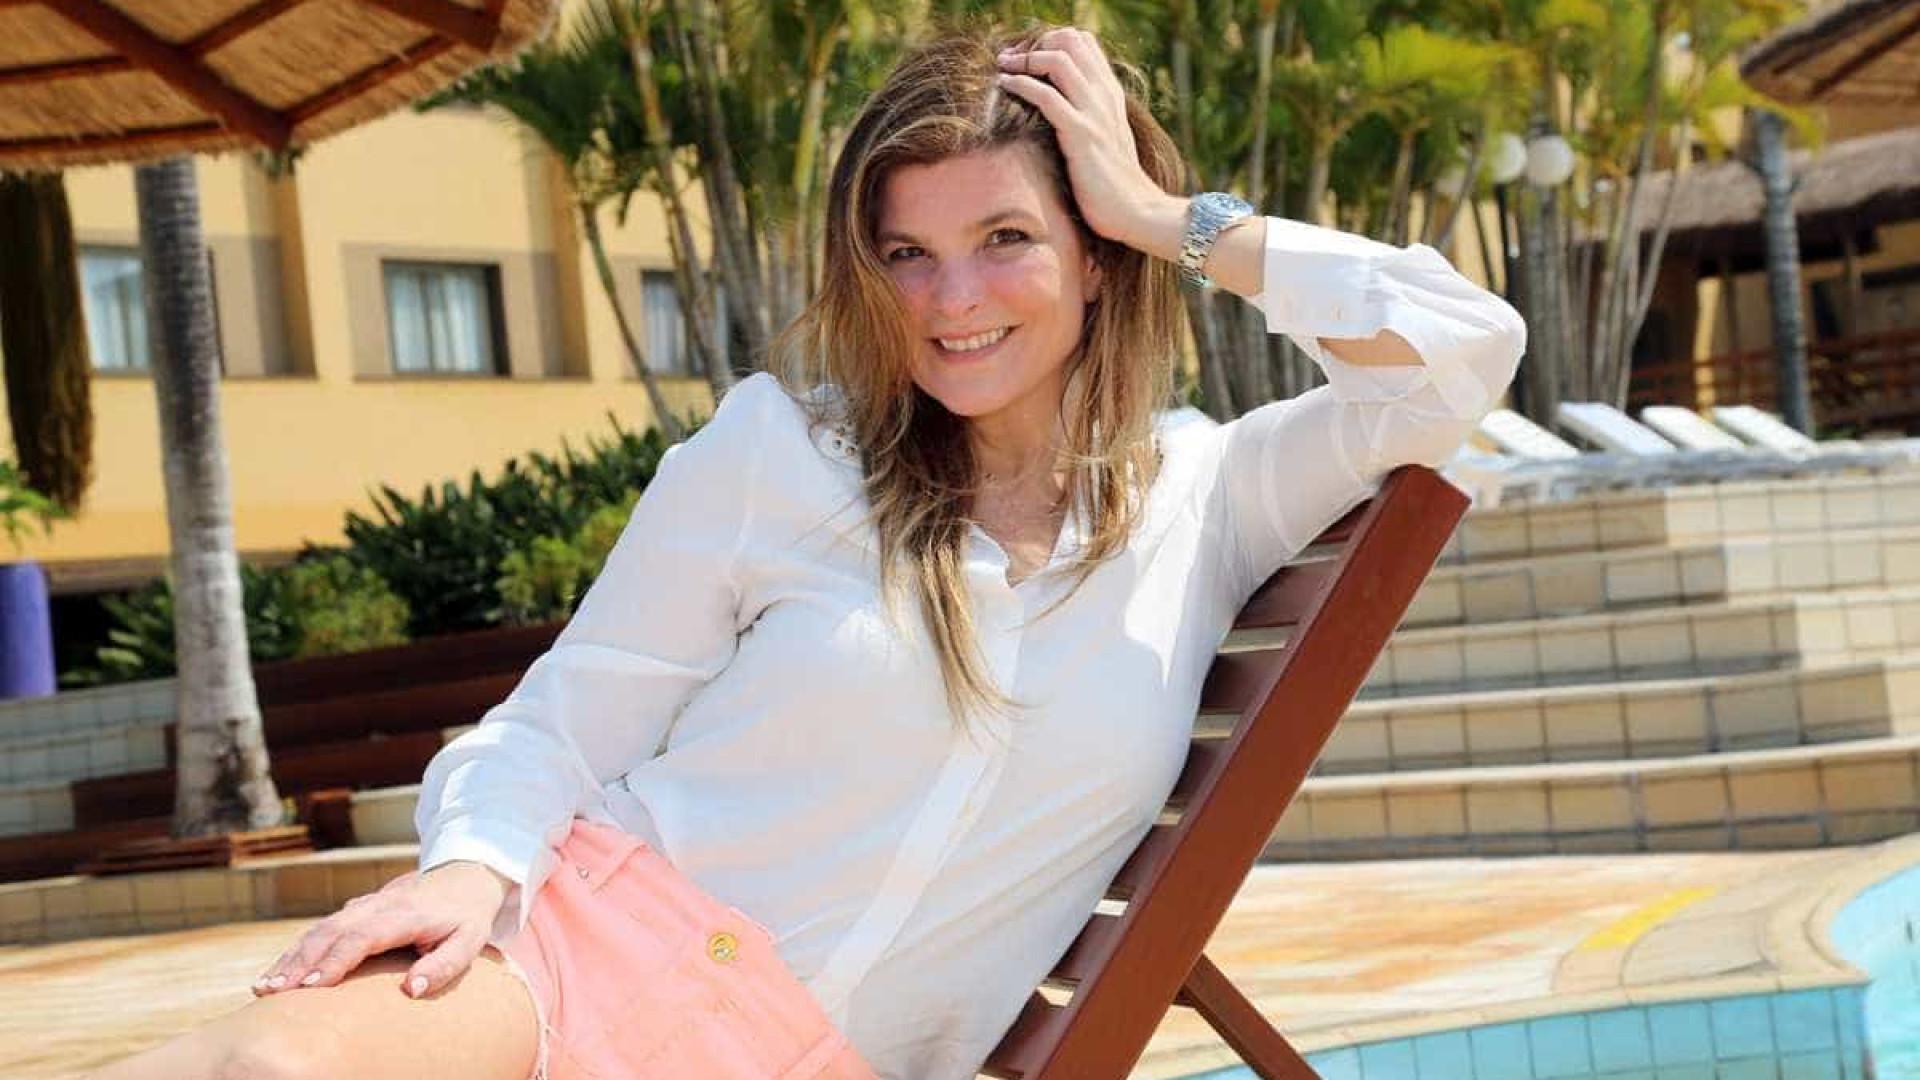 Cristiana Oliveira revela anorexia na juventude: 'Eu era paranoica'